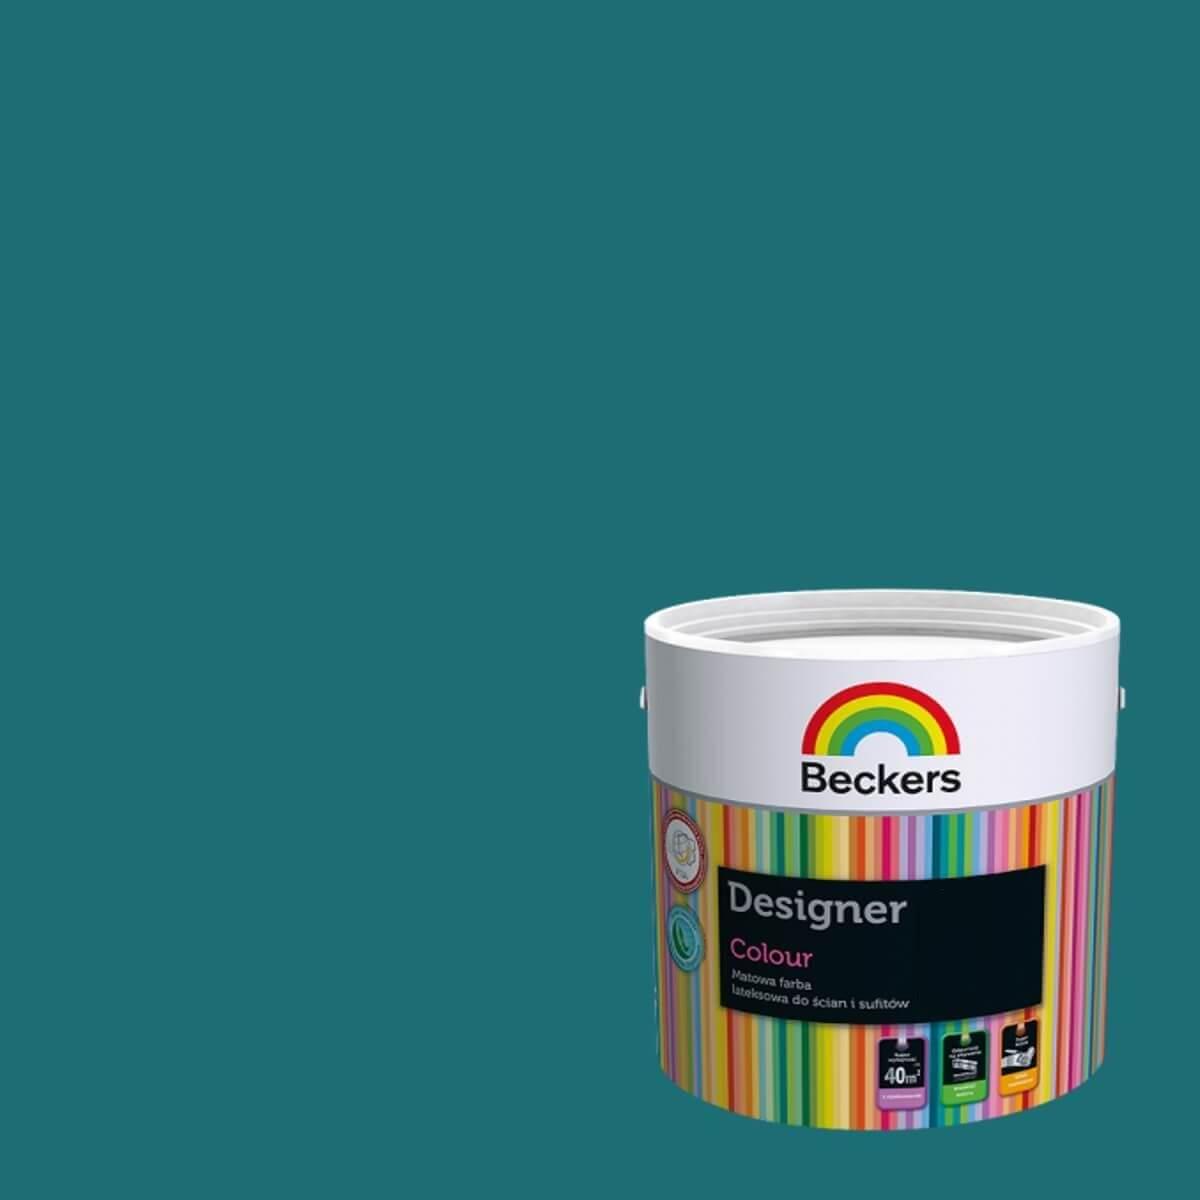 Beckers Farba Lateksowa Designer Colour Cleopatra 5l